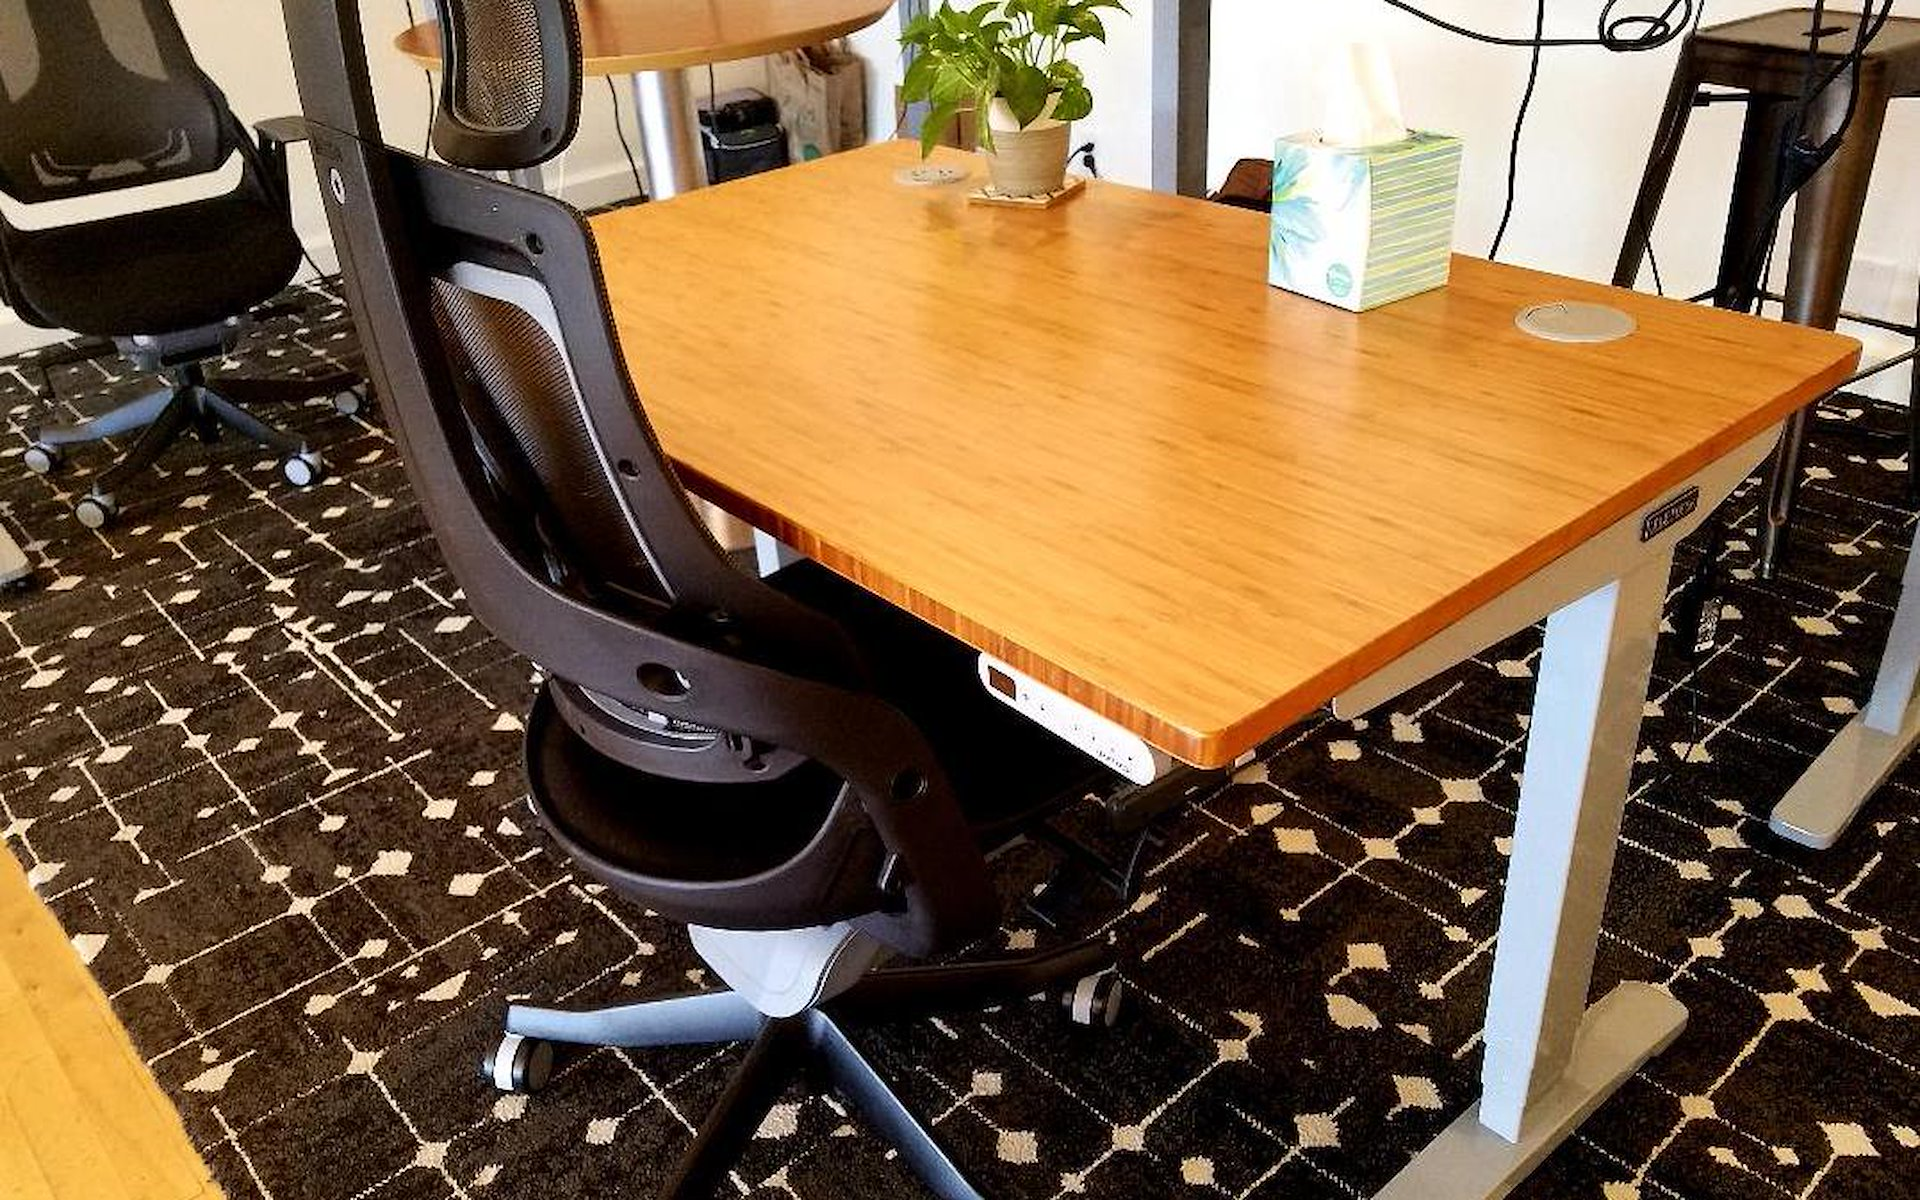 fibercove - Dedicated Desk